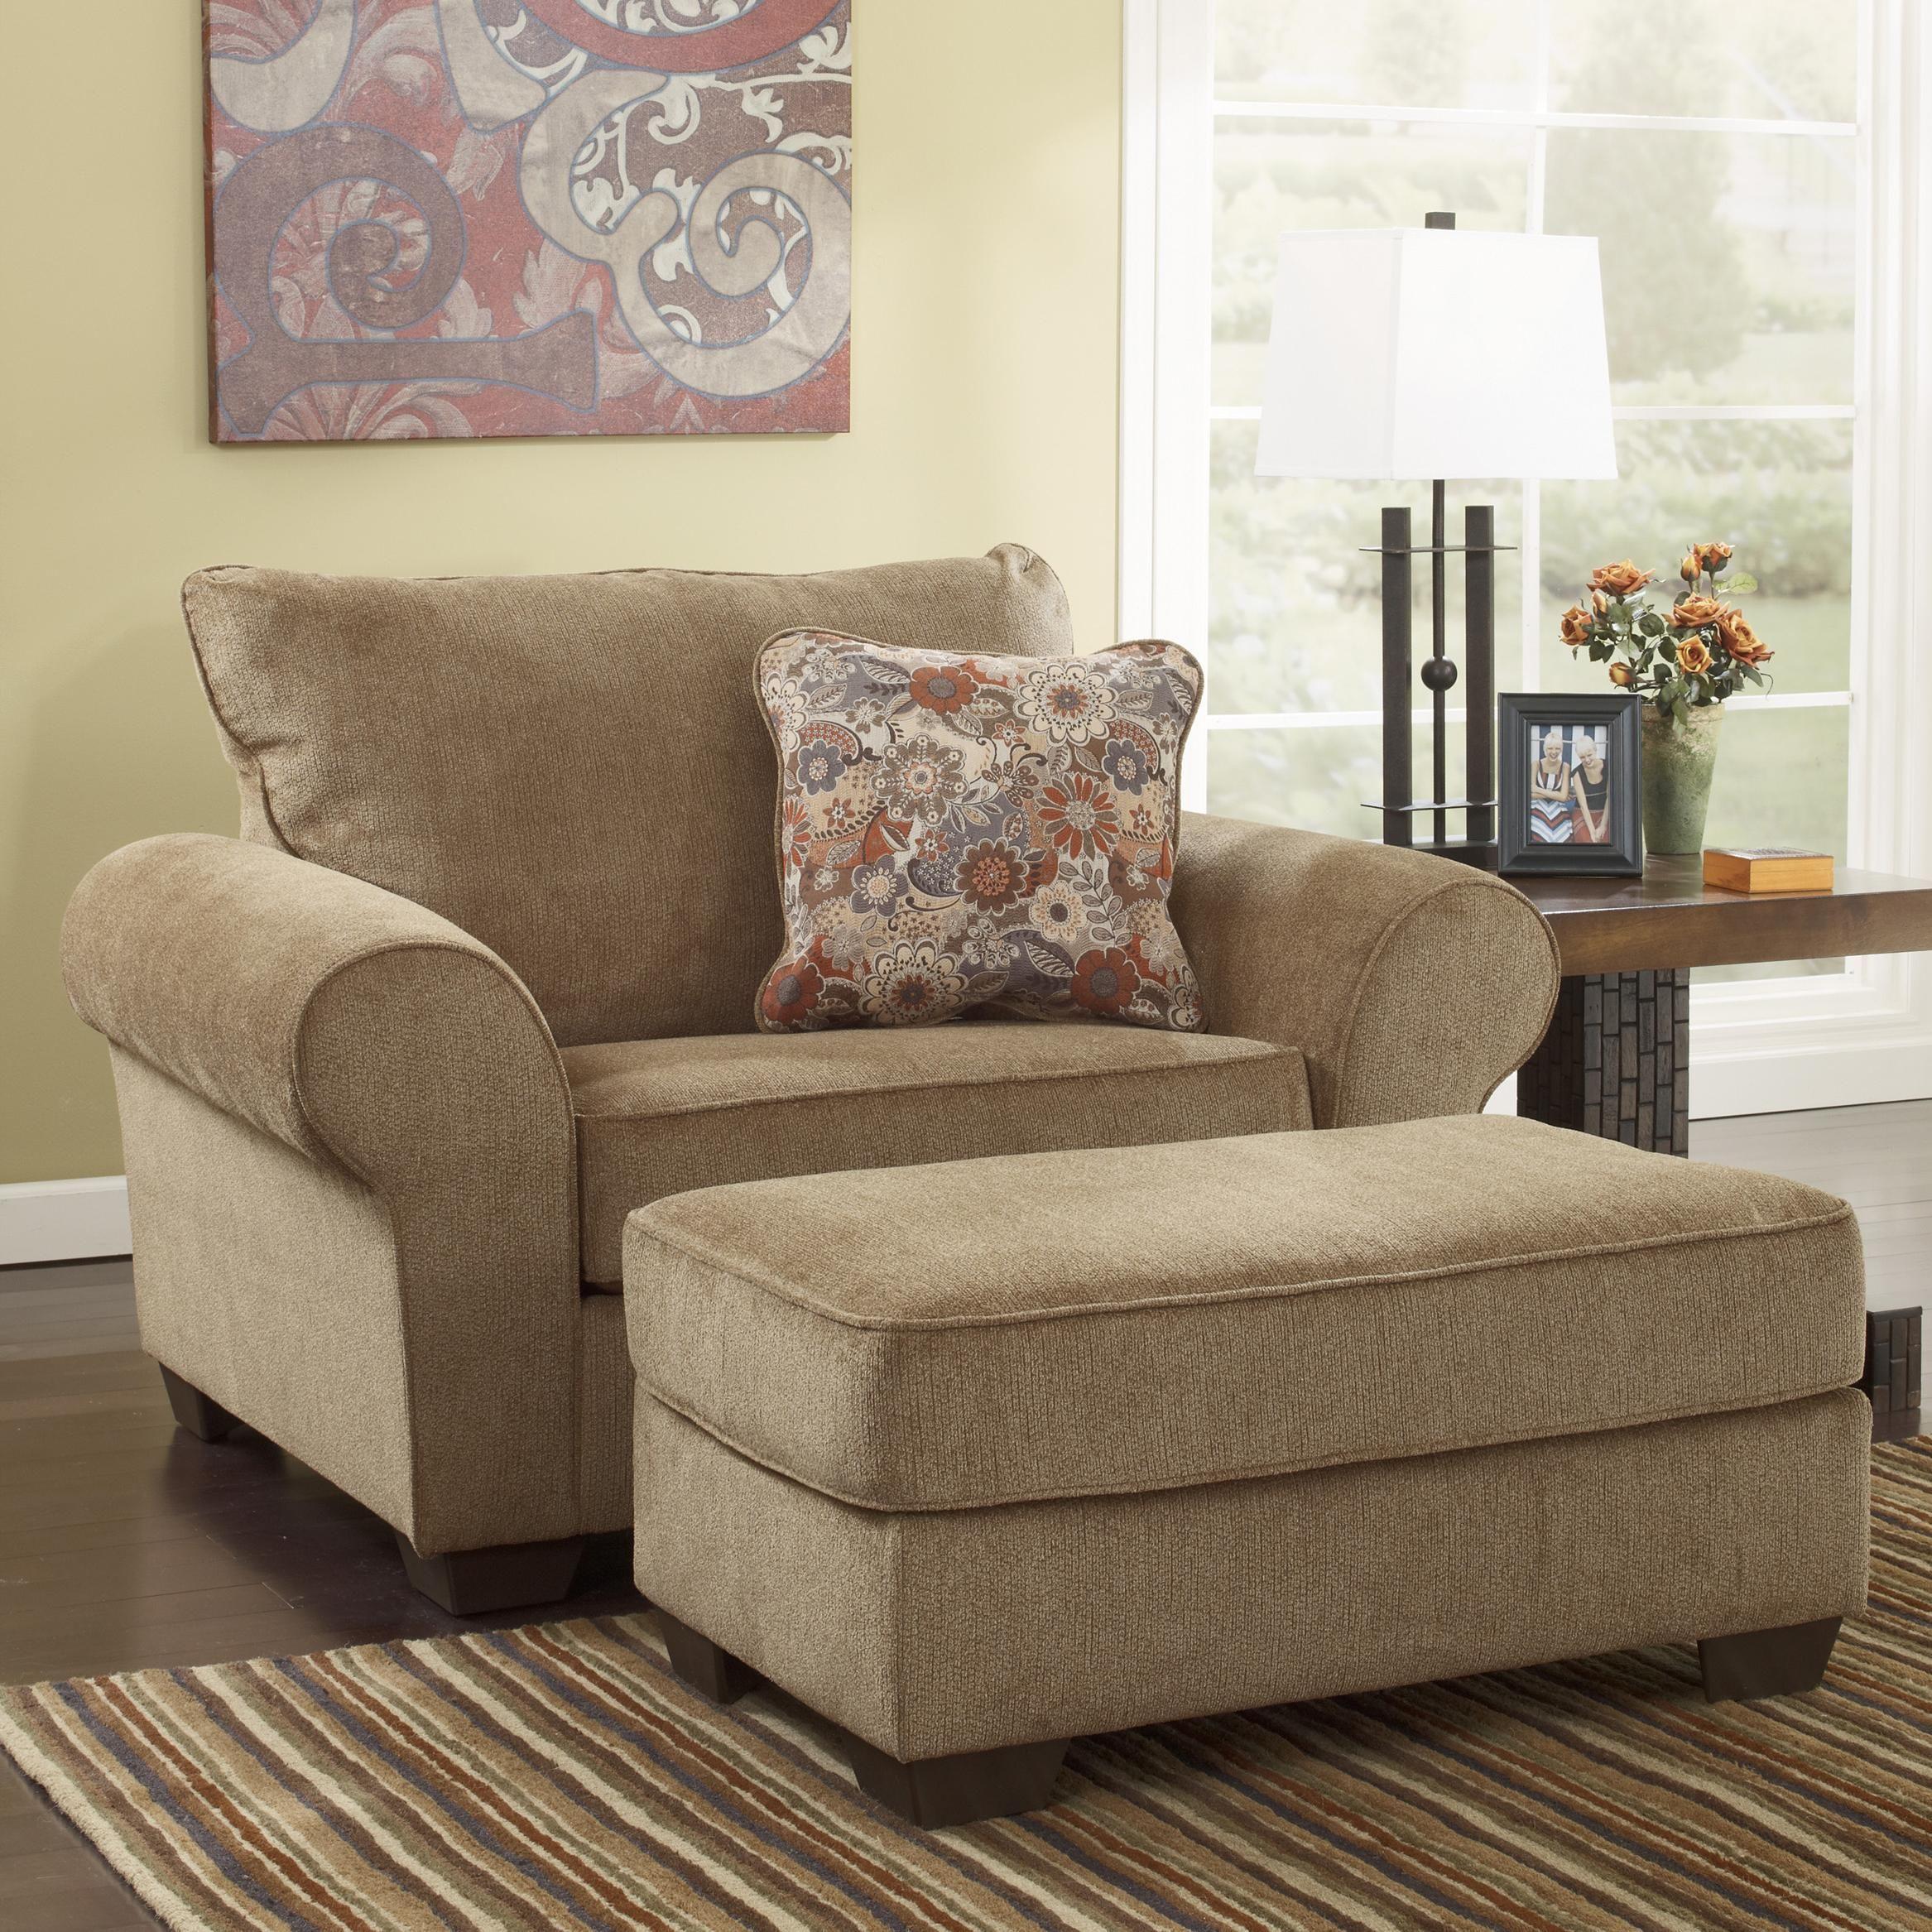 Hariston Shitake Sofa | Home Design Ideas and Inspiration